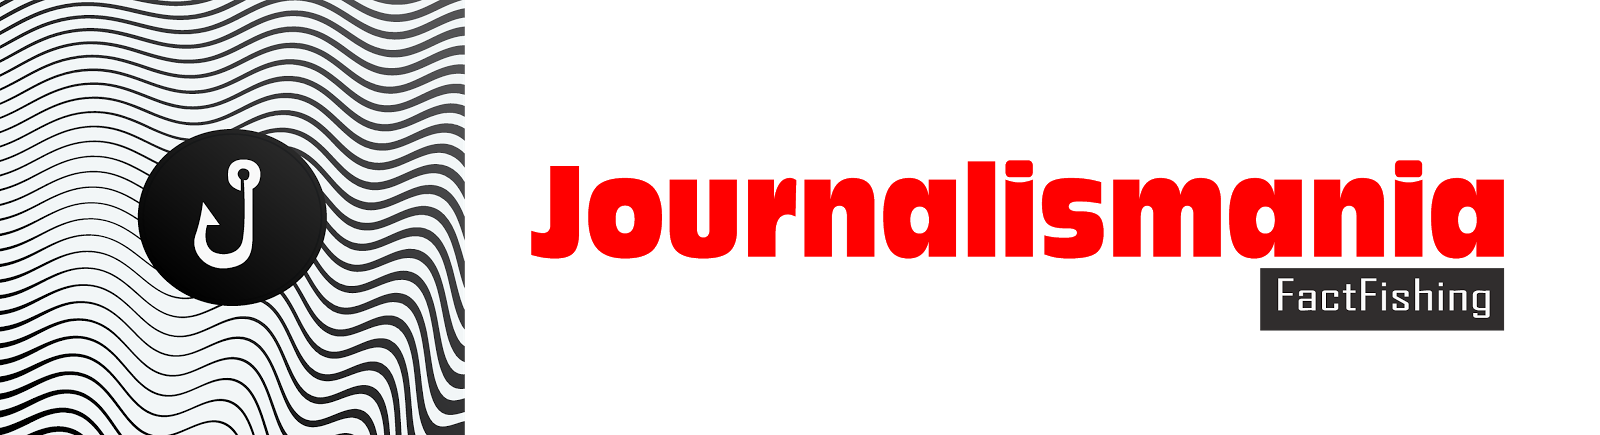 Journalismania